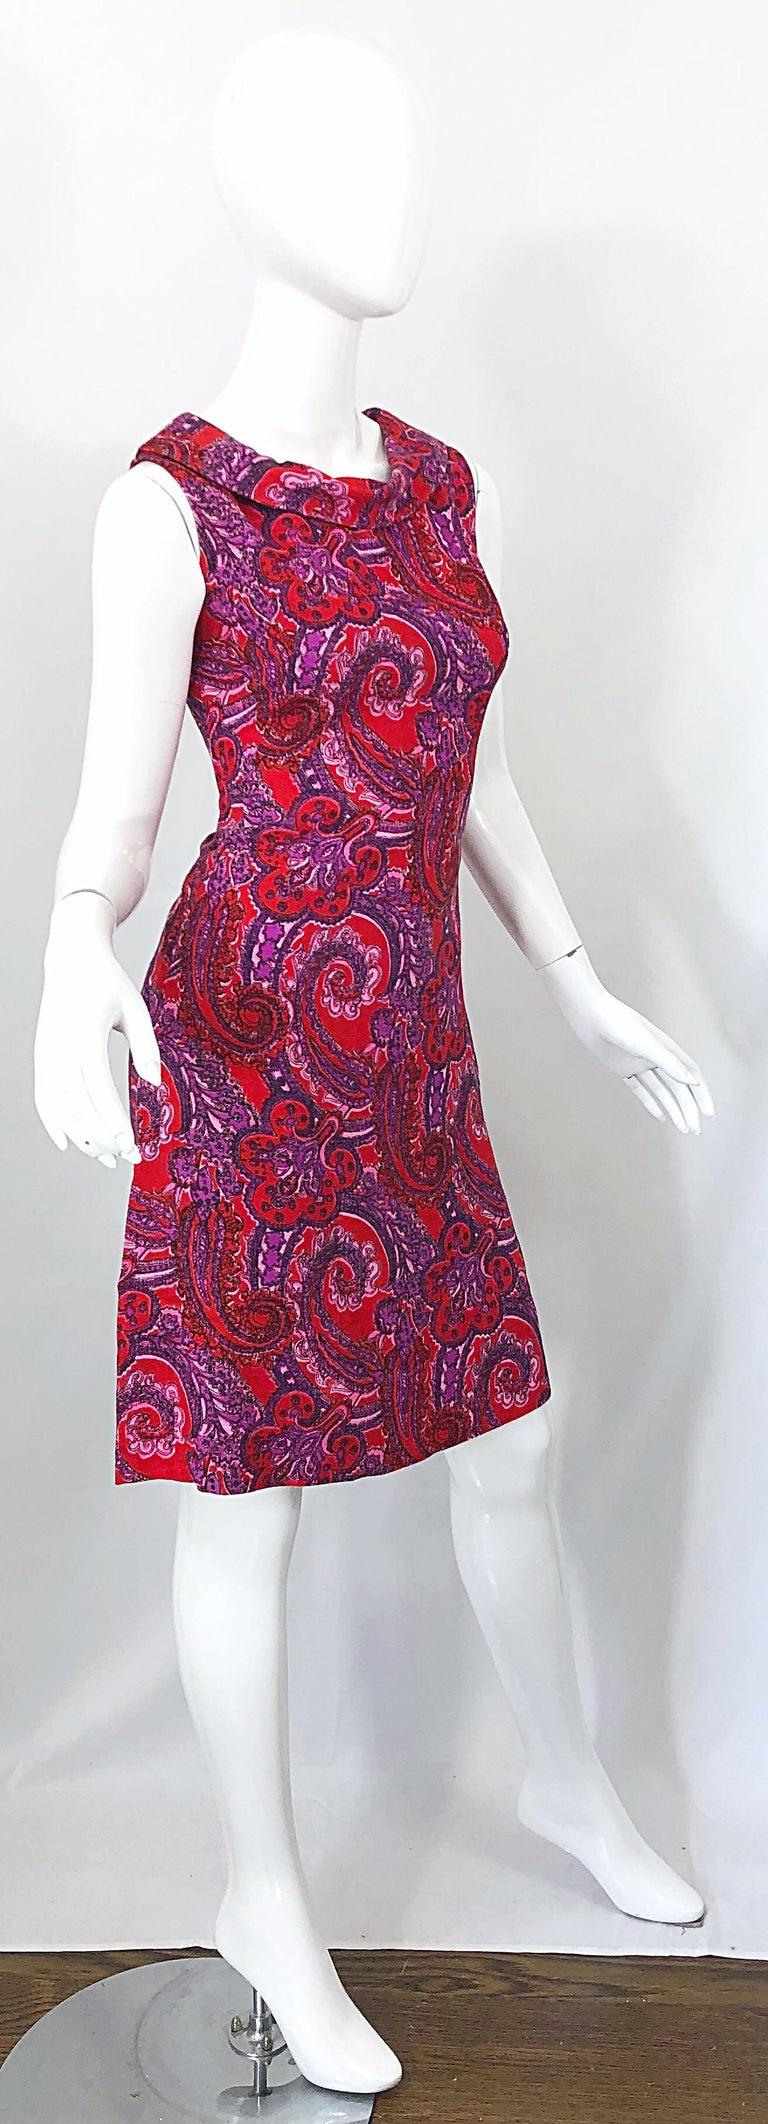 Chic 1960s Irish Linen Pink + Red + Purple Paisley Vintage 60s Mod Shift Dress For Sale 4